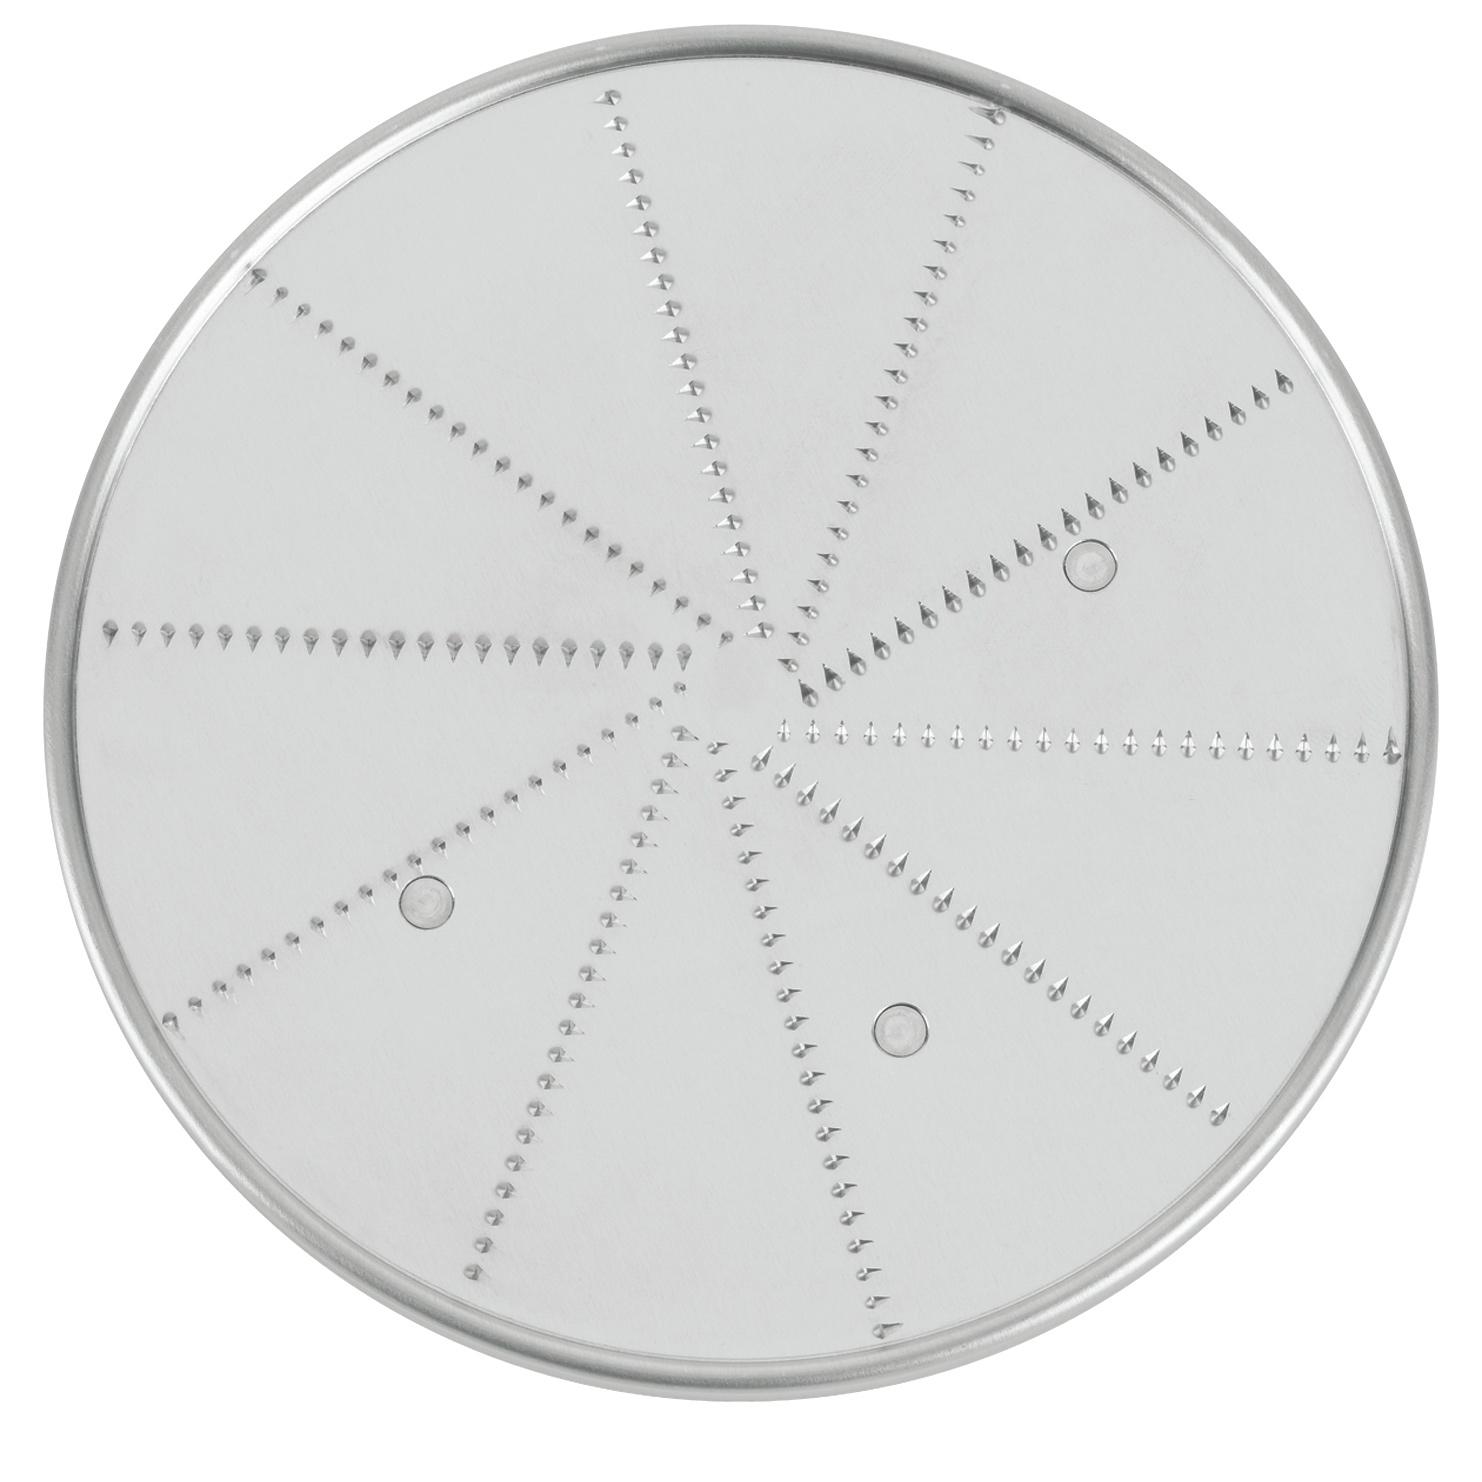 Waring WFP143 food processor, disc plate, shredding / grating